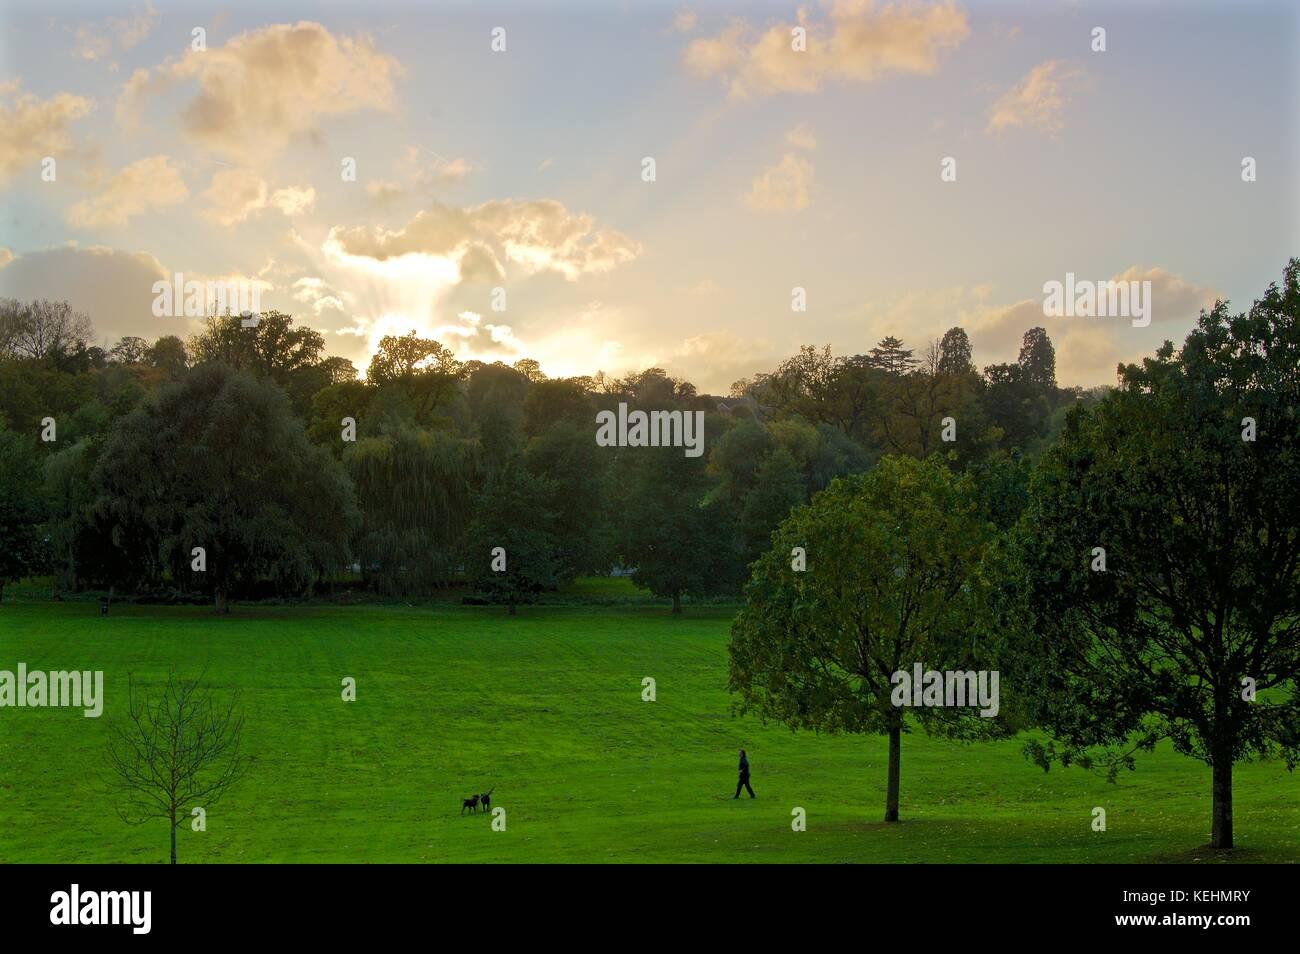 Hempstead Dog Park